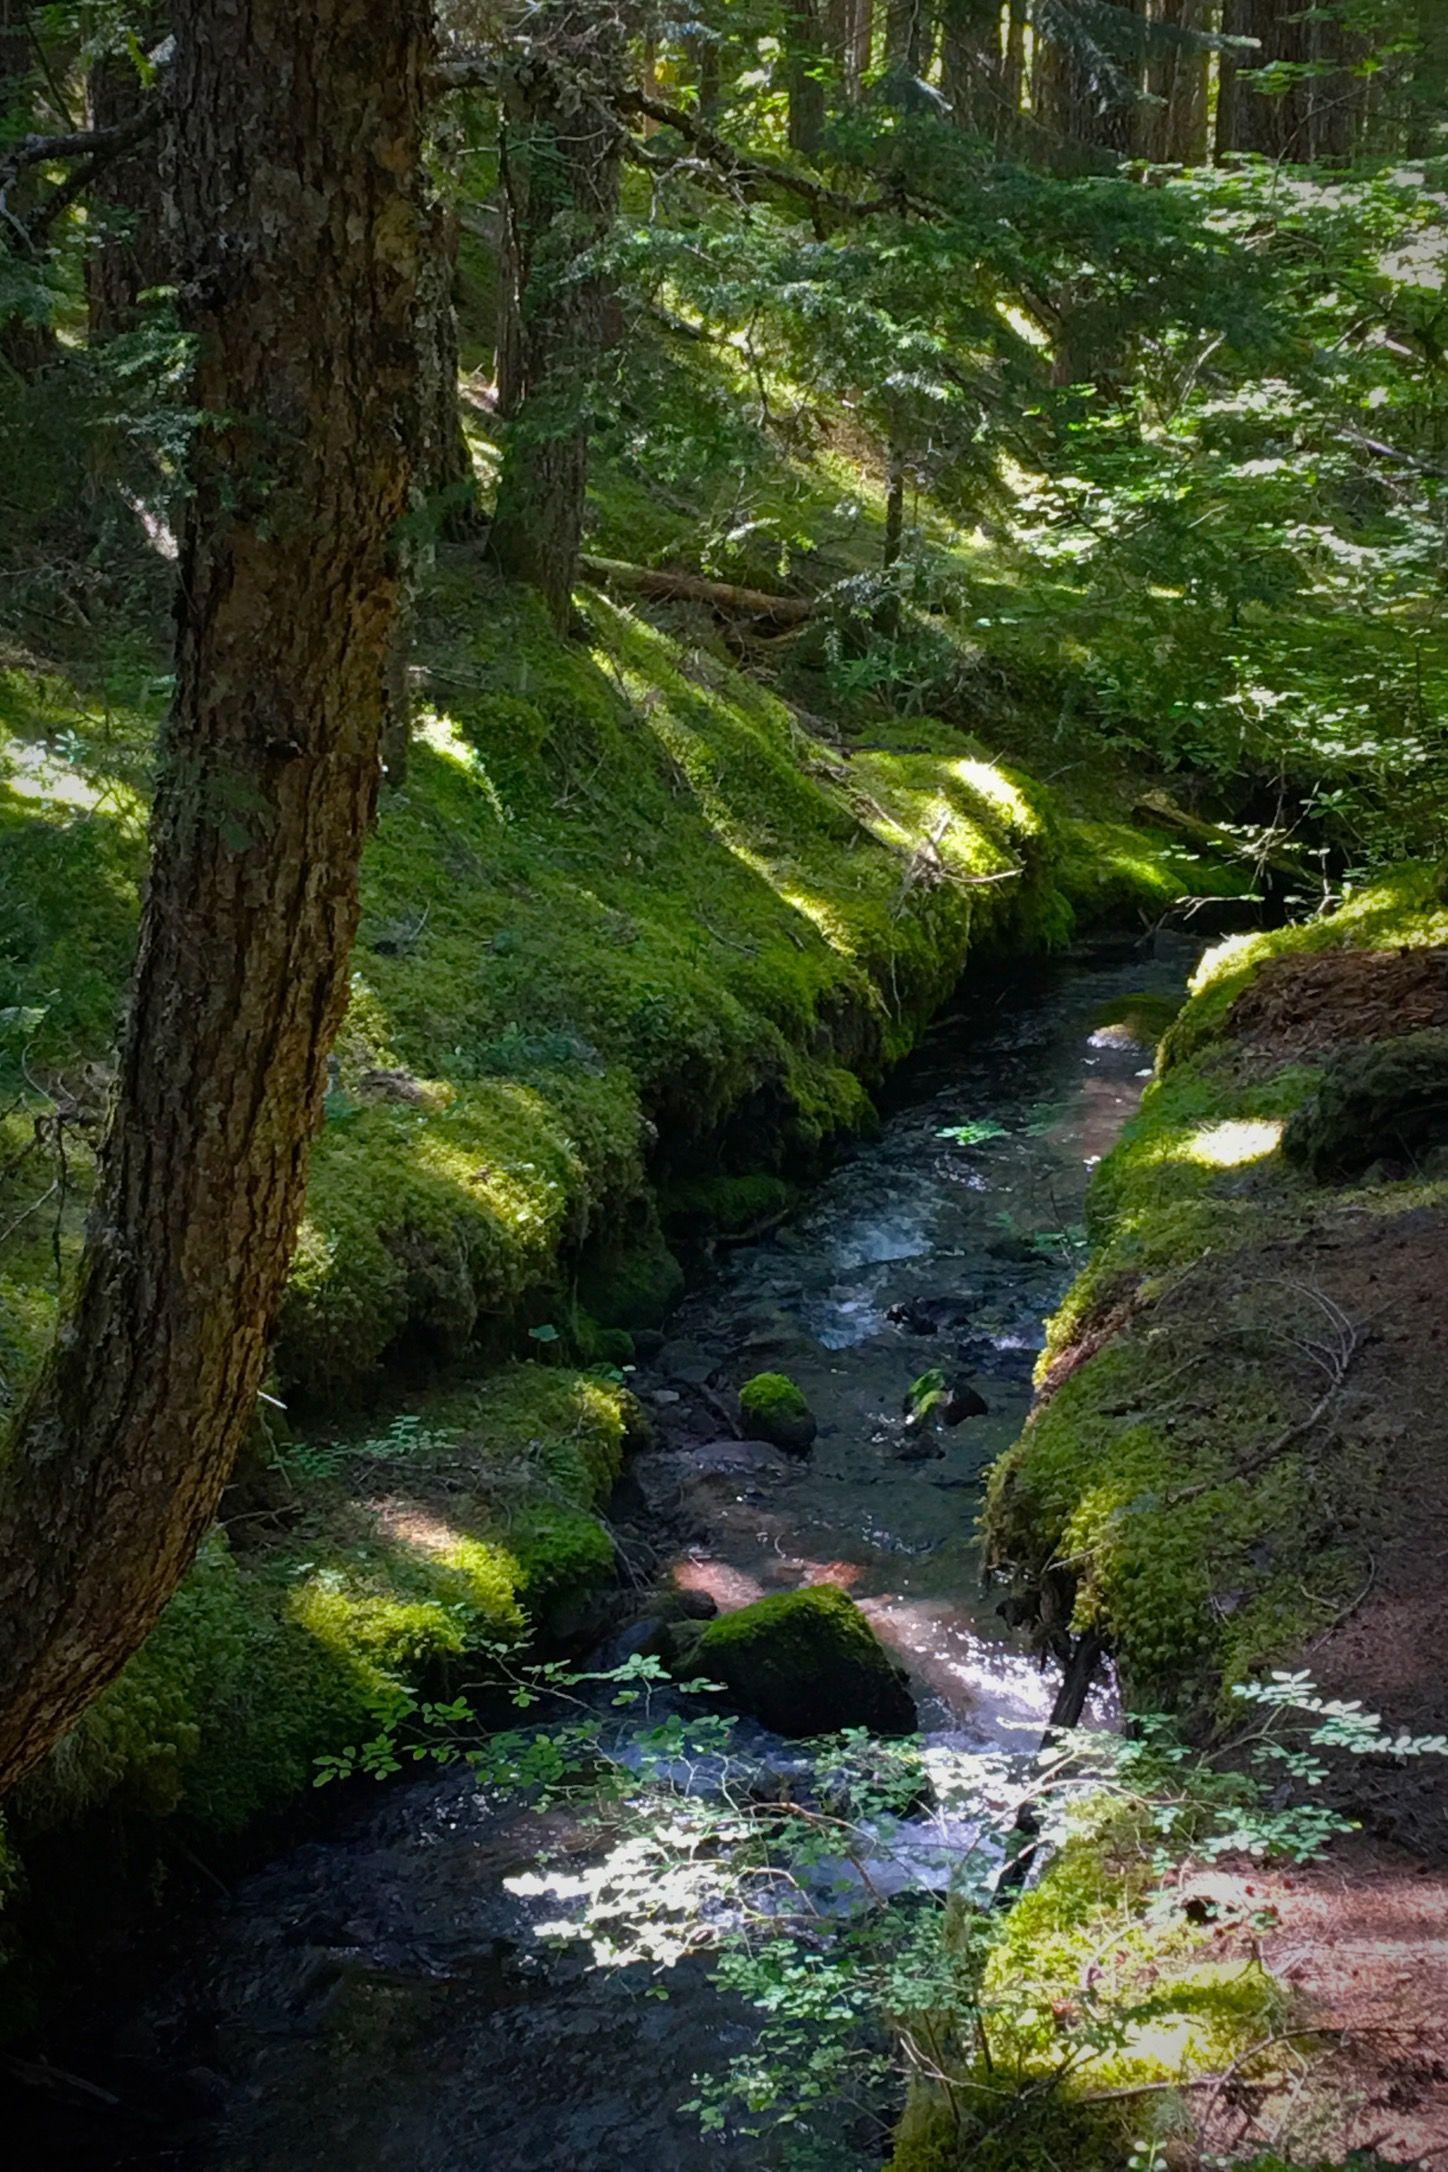 Hiking on Ramona Falls Trail, in the Cascades near Mt